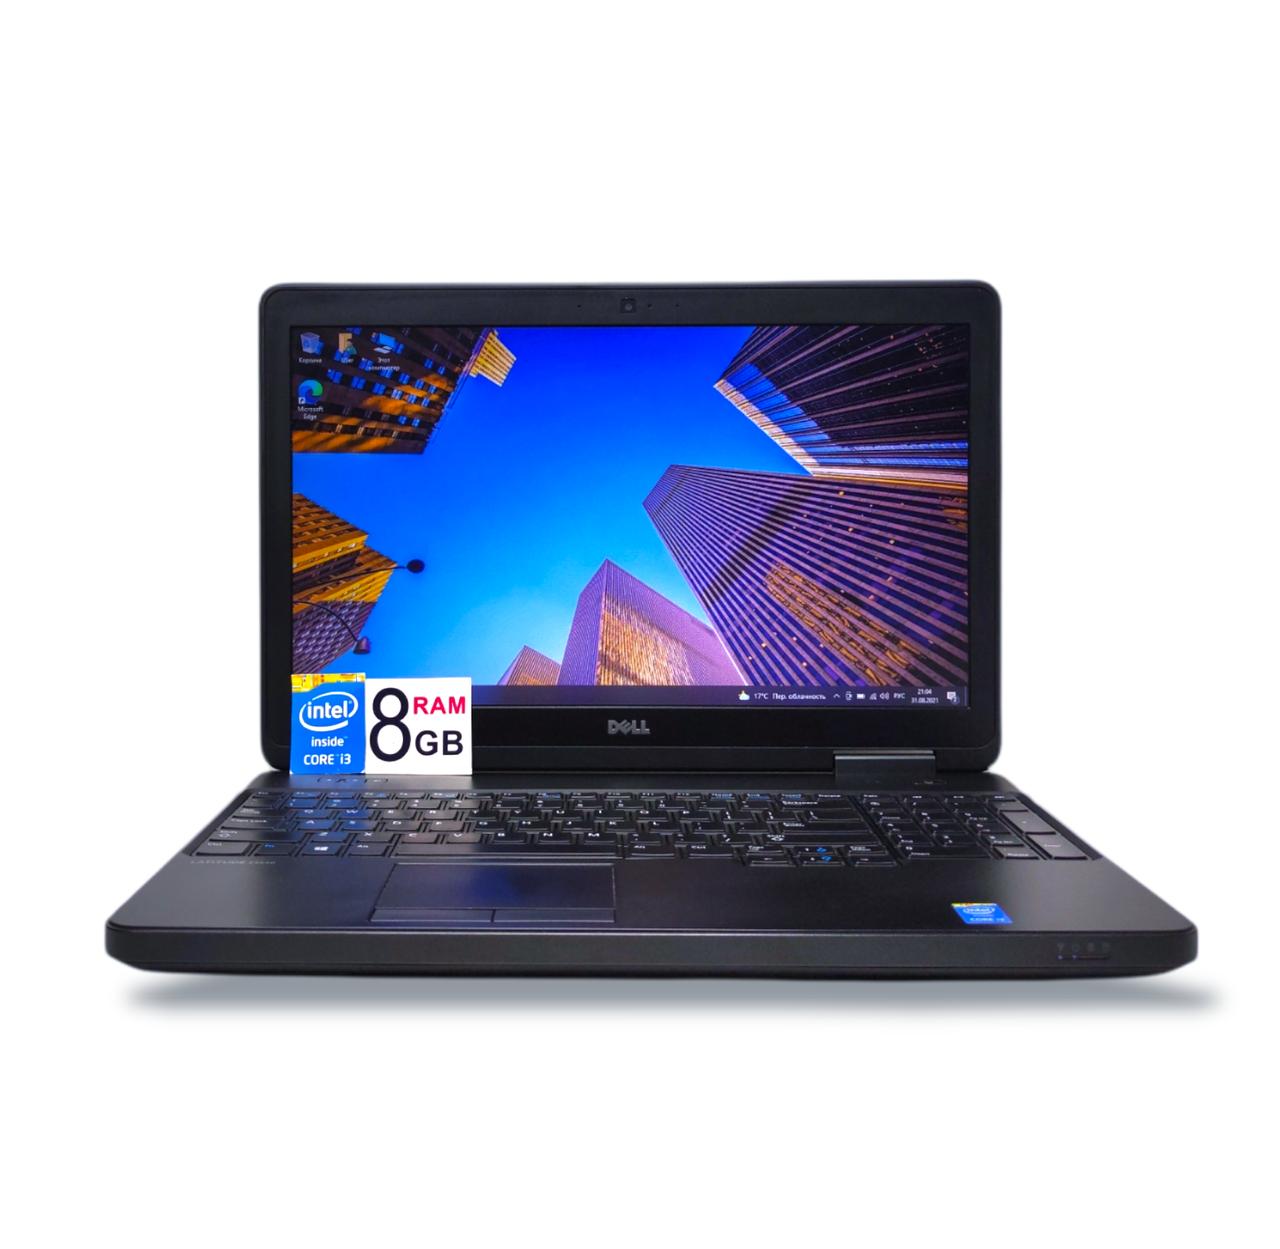 Бізнес ноутбук Dell Latitude E5540 15.6 i3-4030U 8GB 500GB